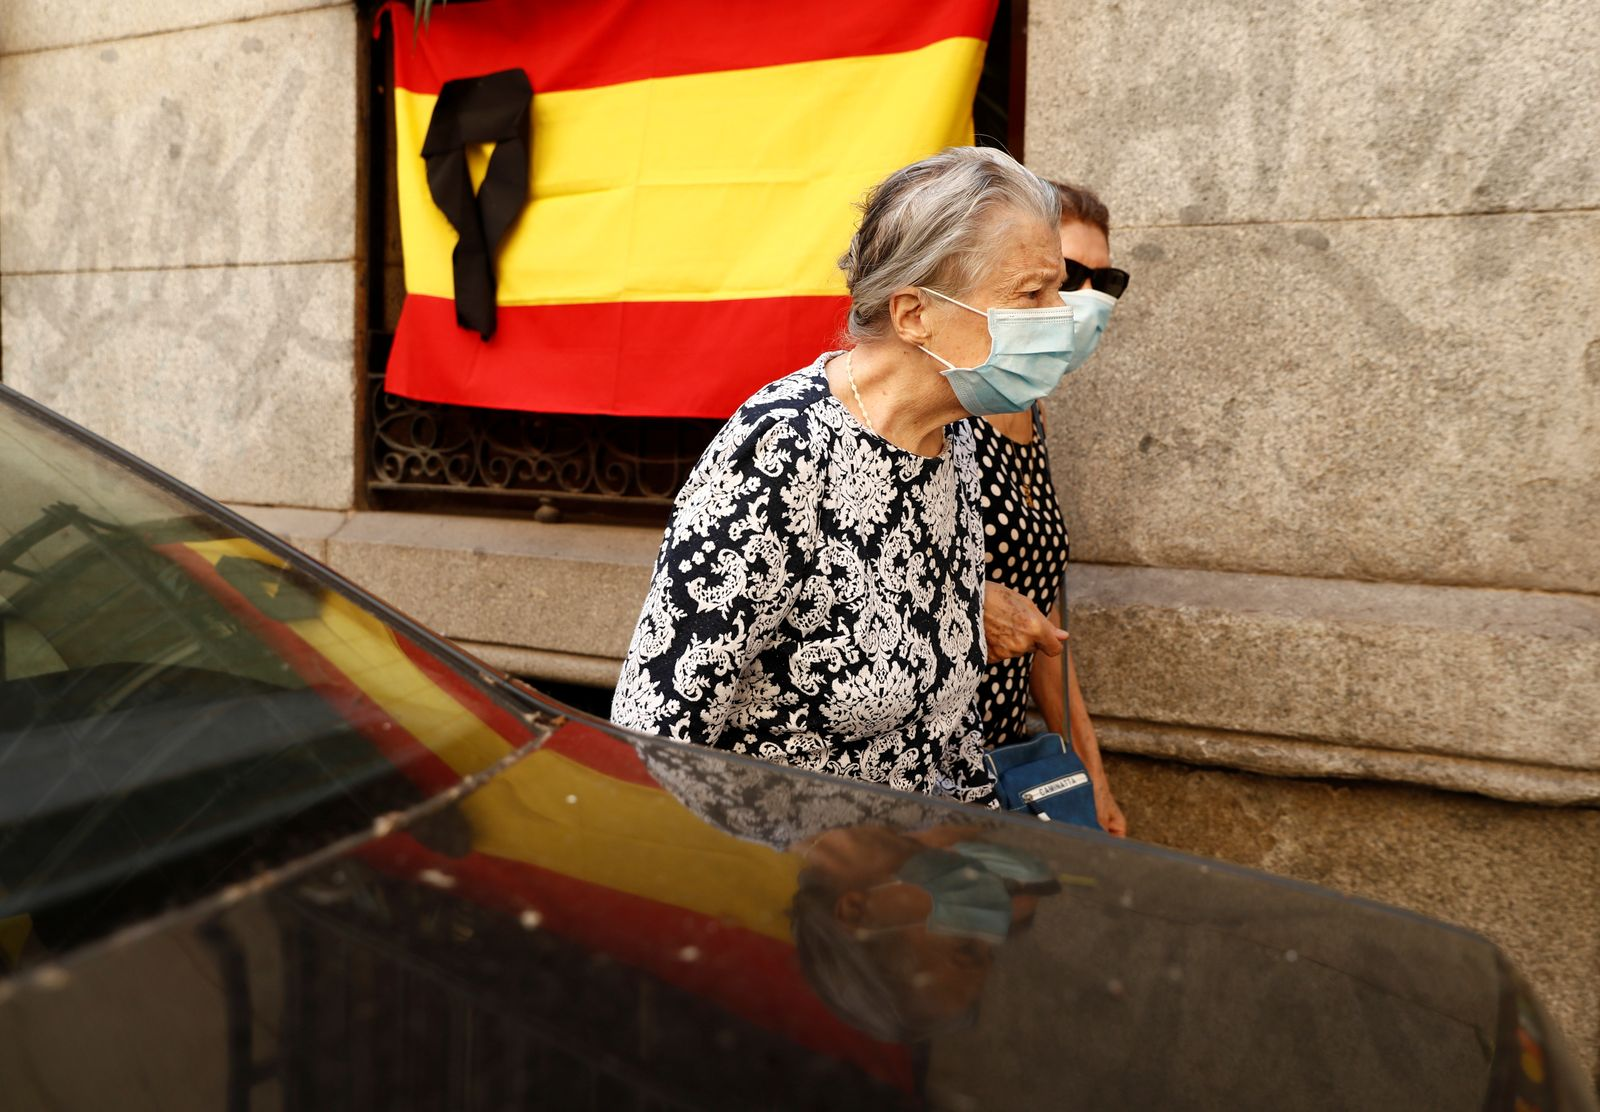 HEALTH-CORONAVIRUS/SPAIN